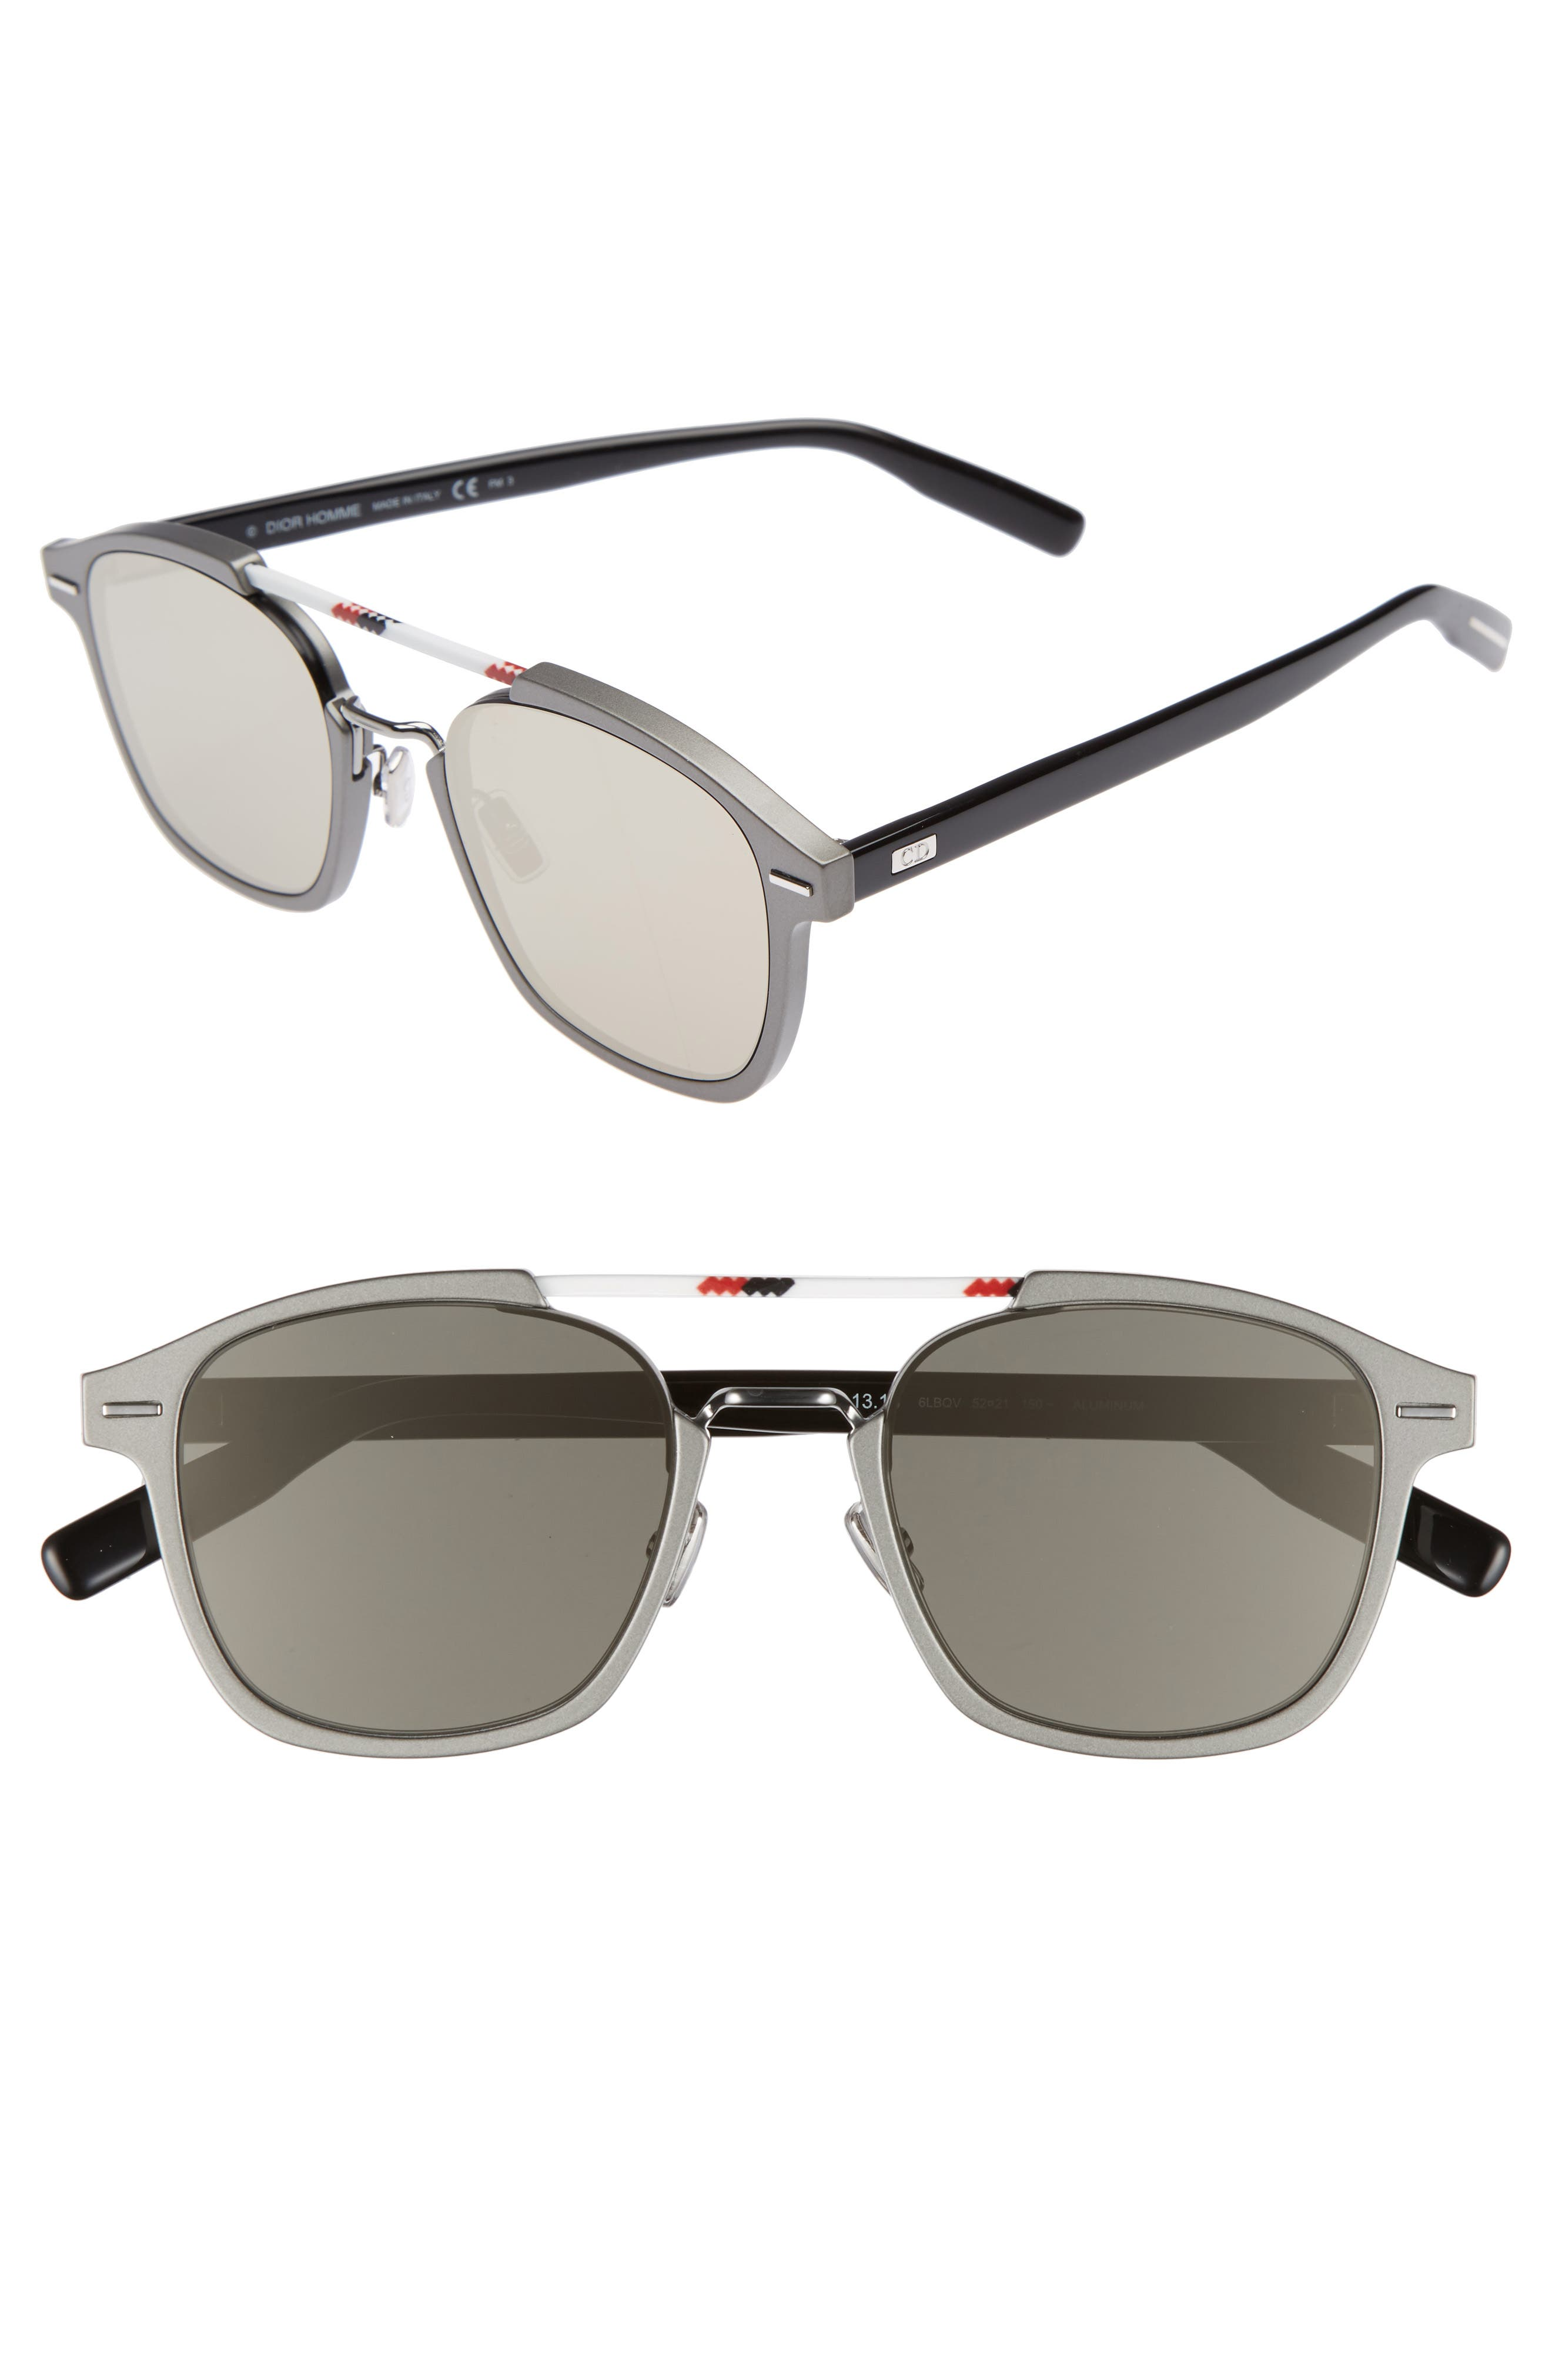 AL13.13 52mm Sunglasses,                             Main thumbnail 1, color,                             RUTHENIUM/ IVORY